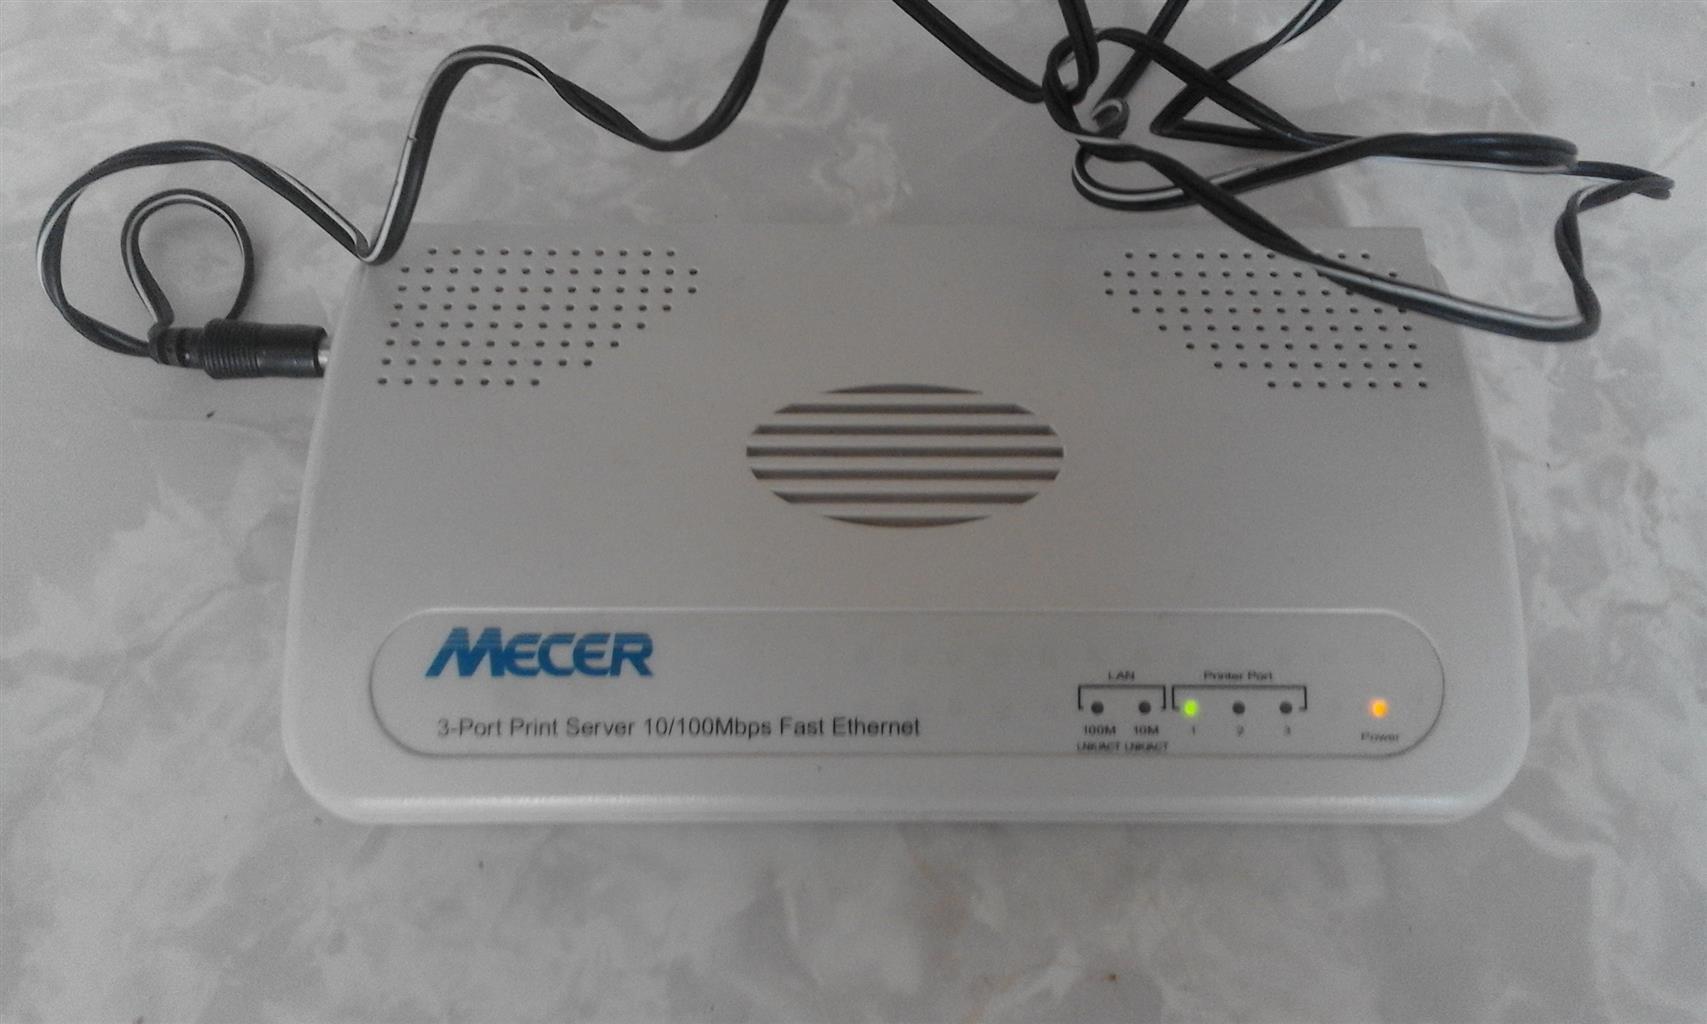 3-Port Print Server Mecer